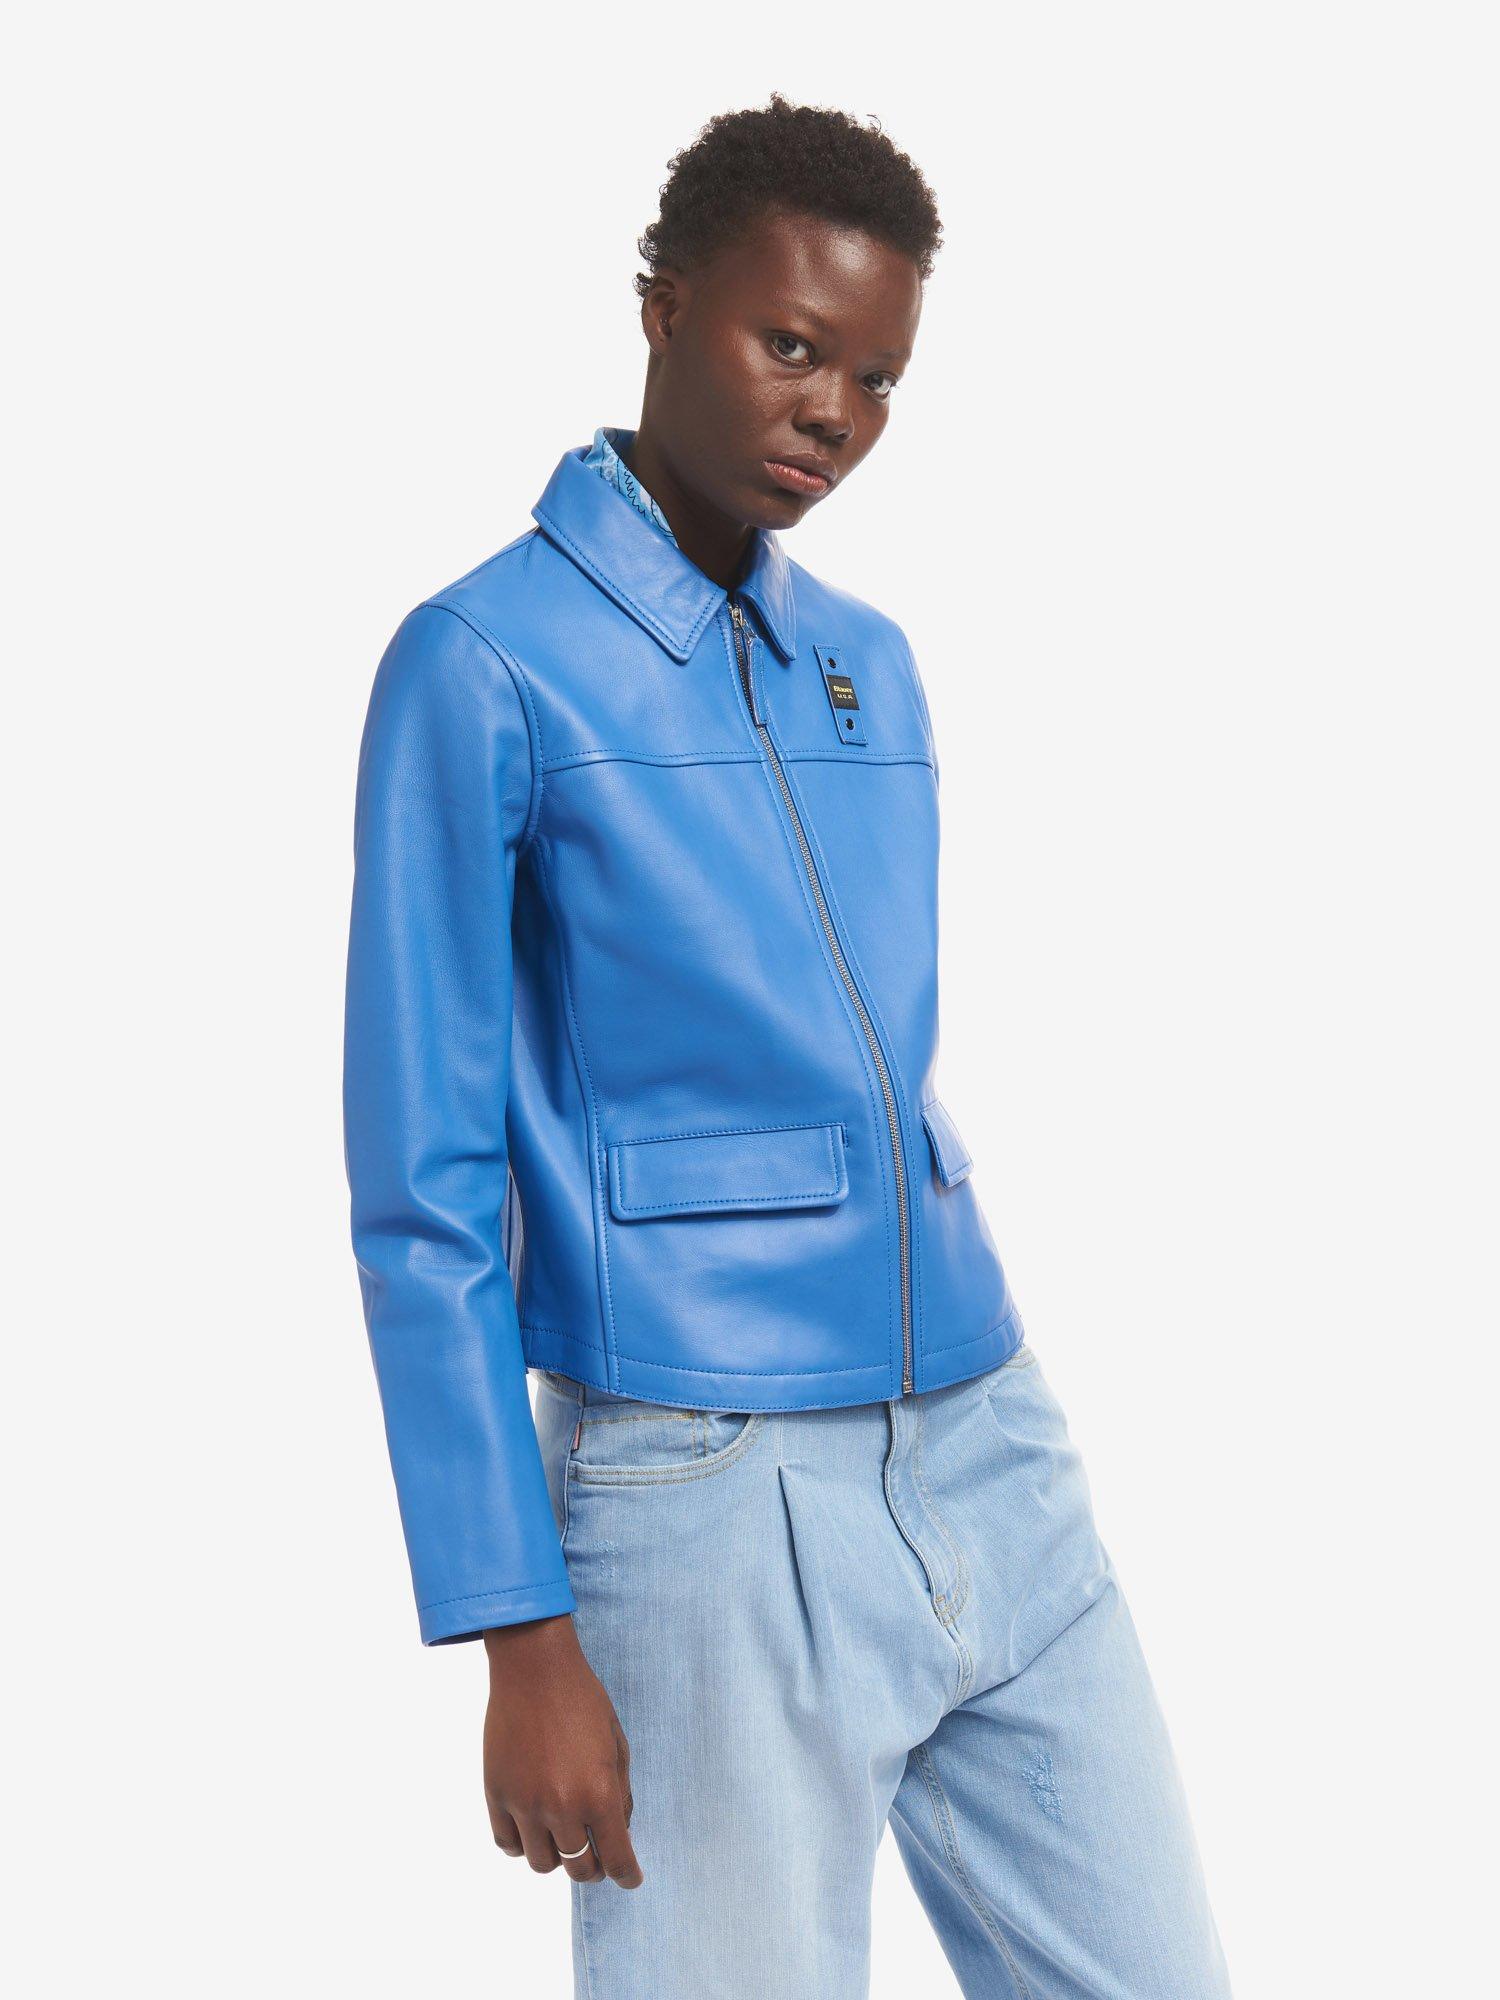 Blauer - BLOUSON EN CUIR SANS DOUBLURE SHERRY - Light Sapphire Blue - Blauer